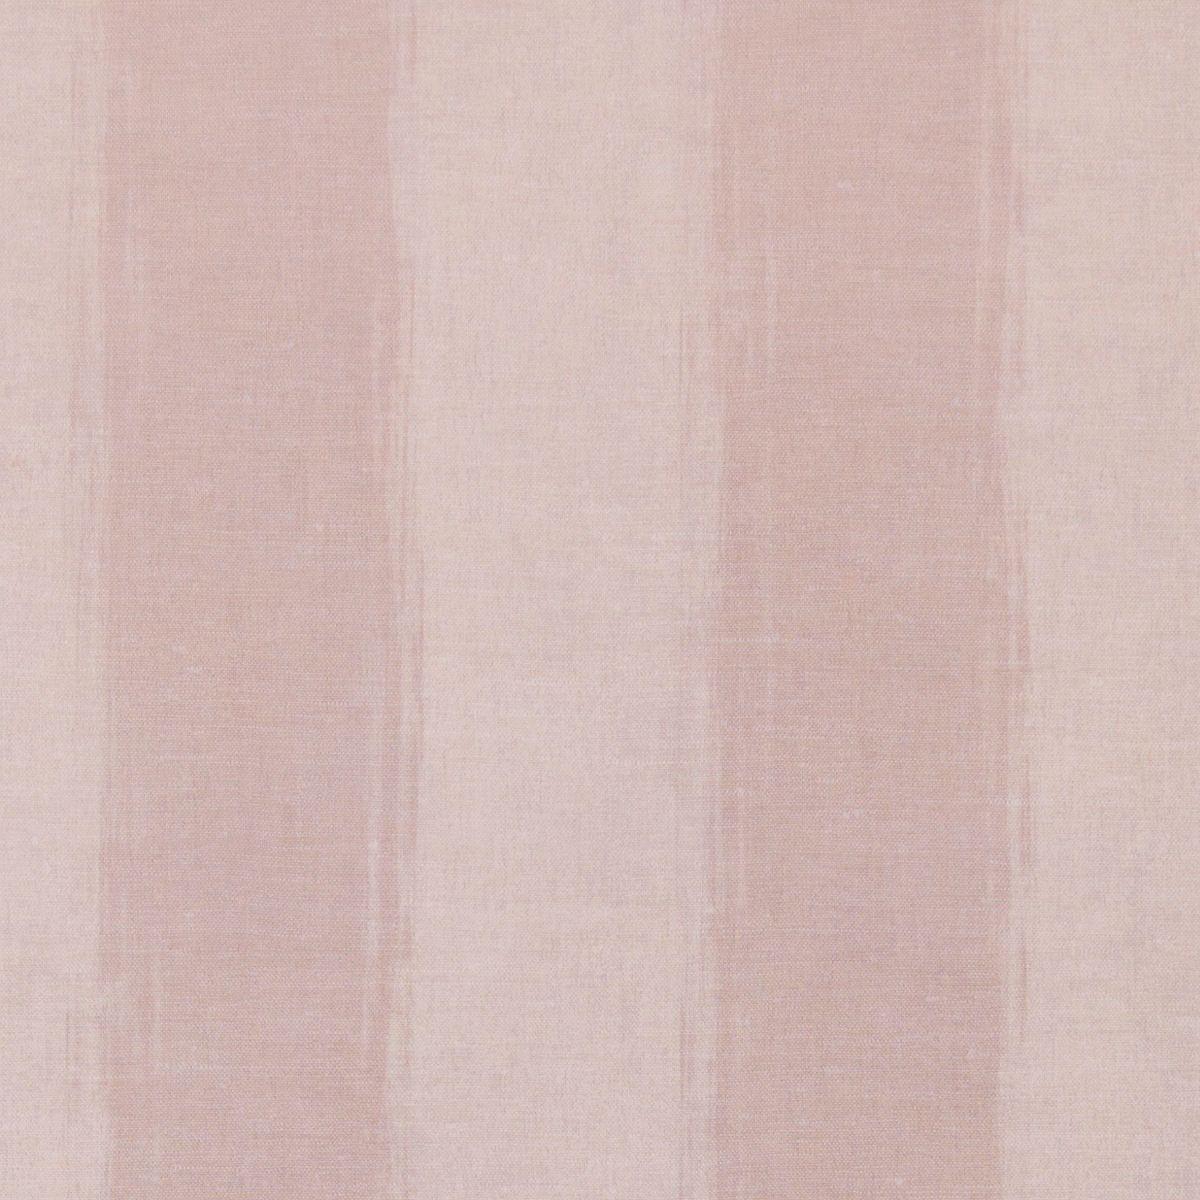 hochwertige tapeten und stoffe b n wallcoverings vliestapete riviera maison 18362 decowunder. Black Bedroom Furniture Sets. Home Design Ideas